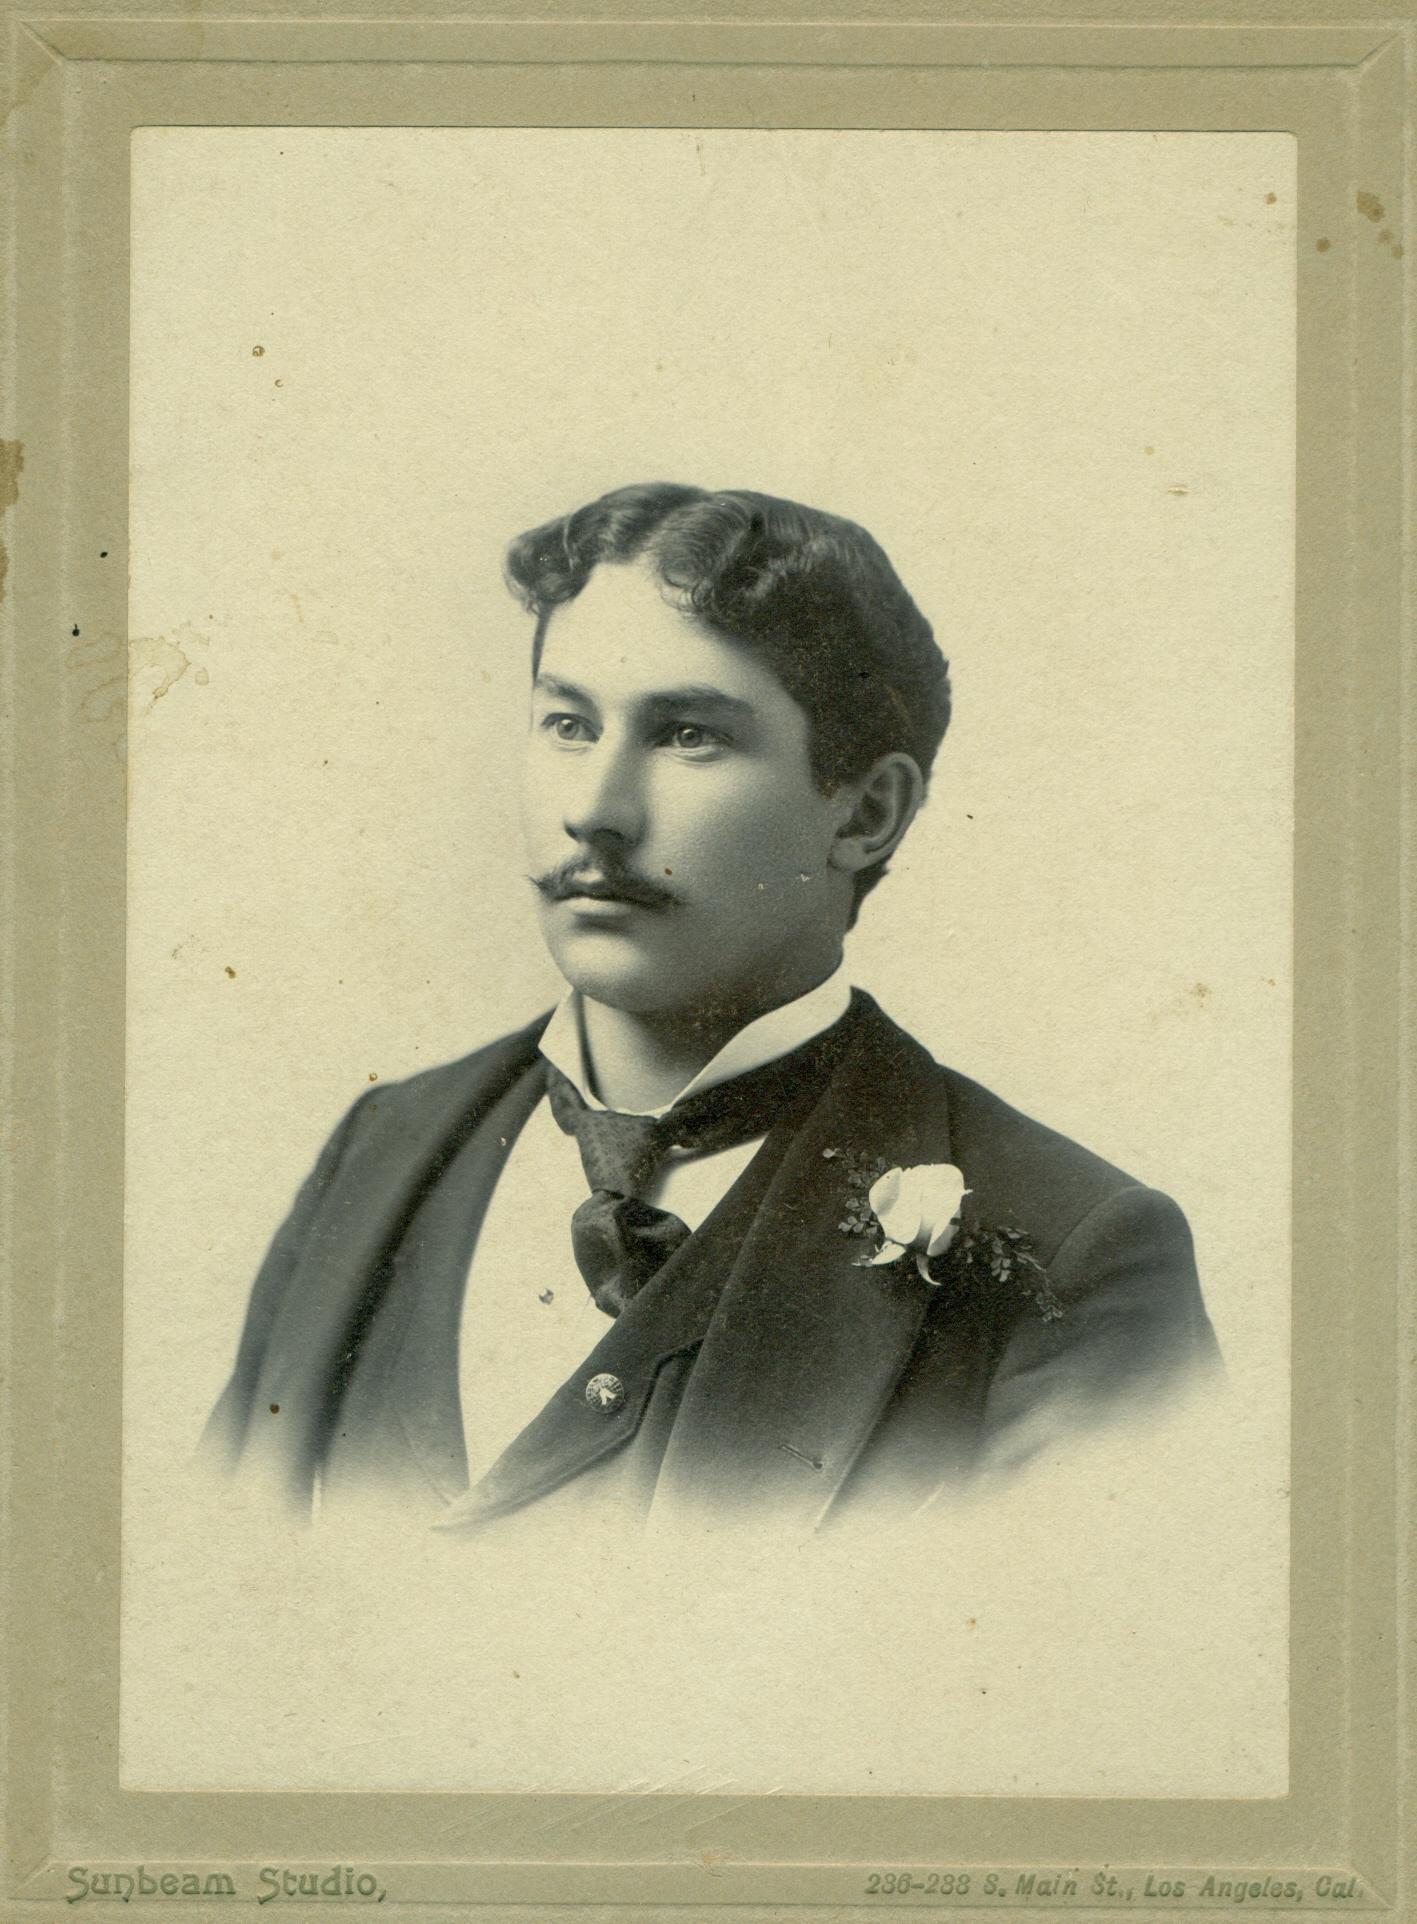 Leroy Roy Frick, Sr